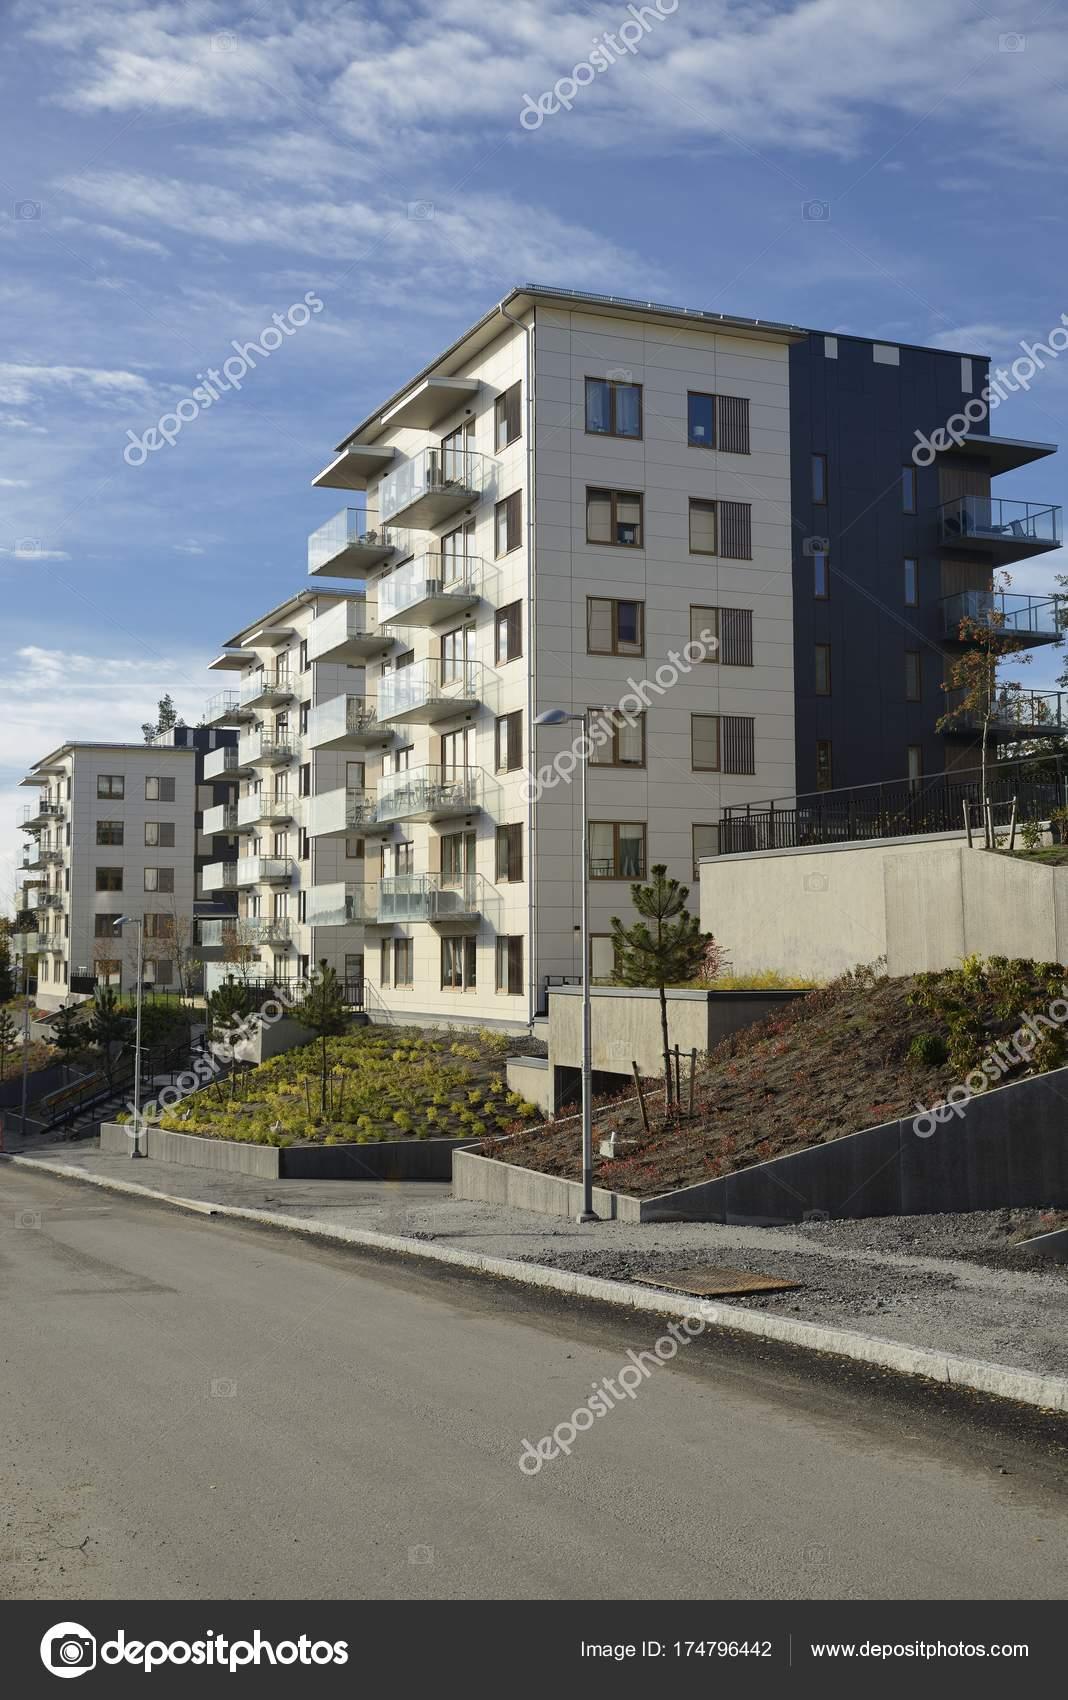 Beeindruckend Moderne Mehrfamilienhäuser Galerie Von Sind Mehrfamilienhäuser Stockholm Schweden — Stockfoto